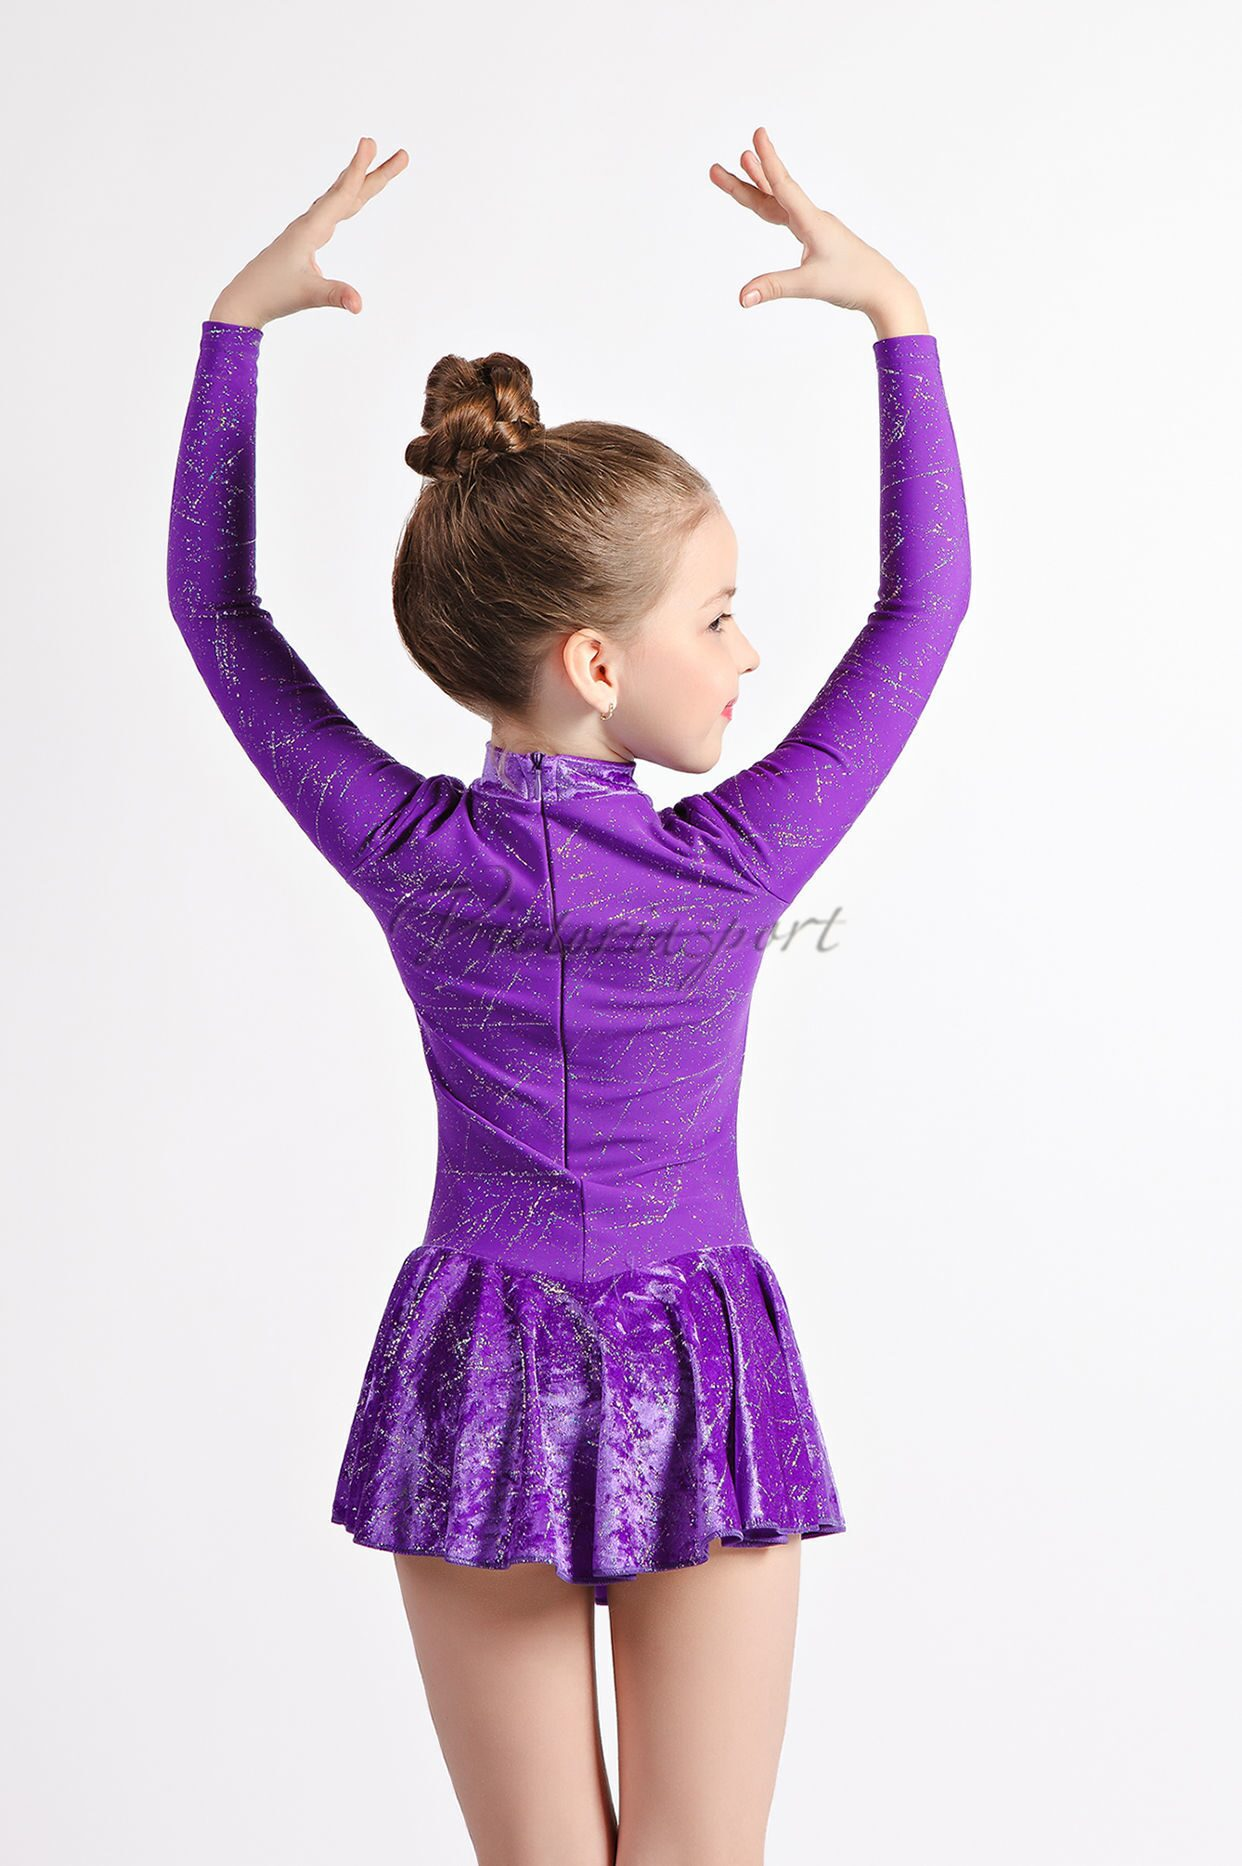 c9a72e7ba3c78 Одежда для танцев | Интернет-магазин VS